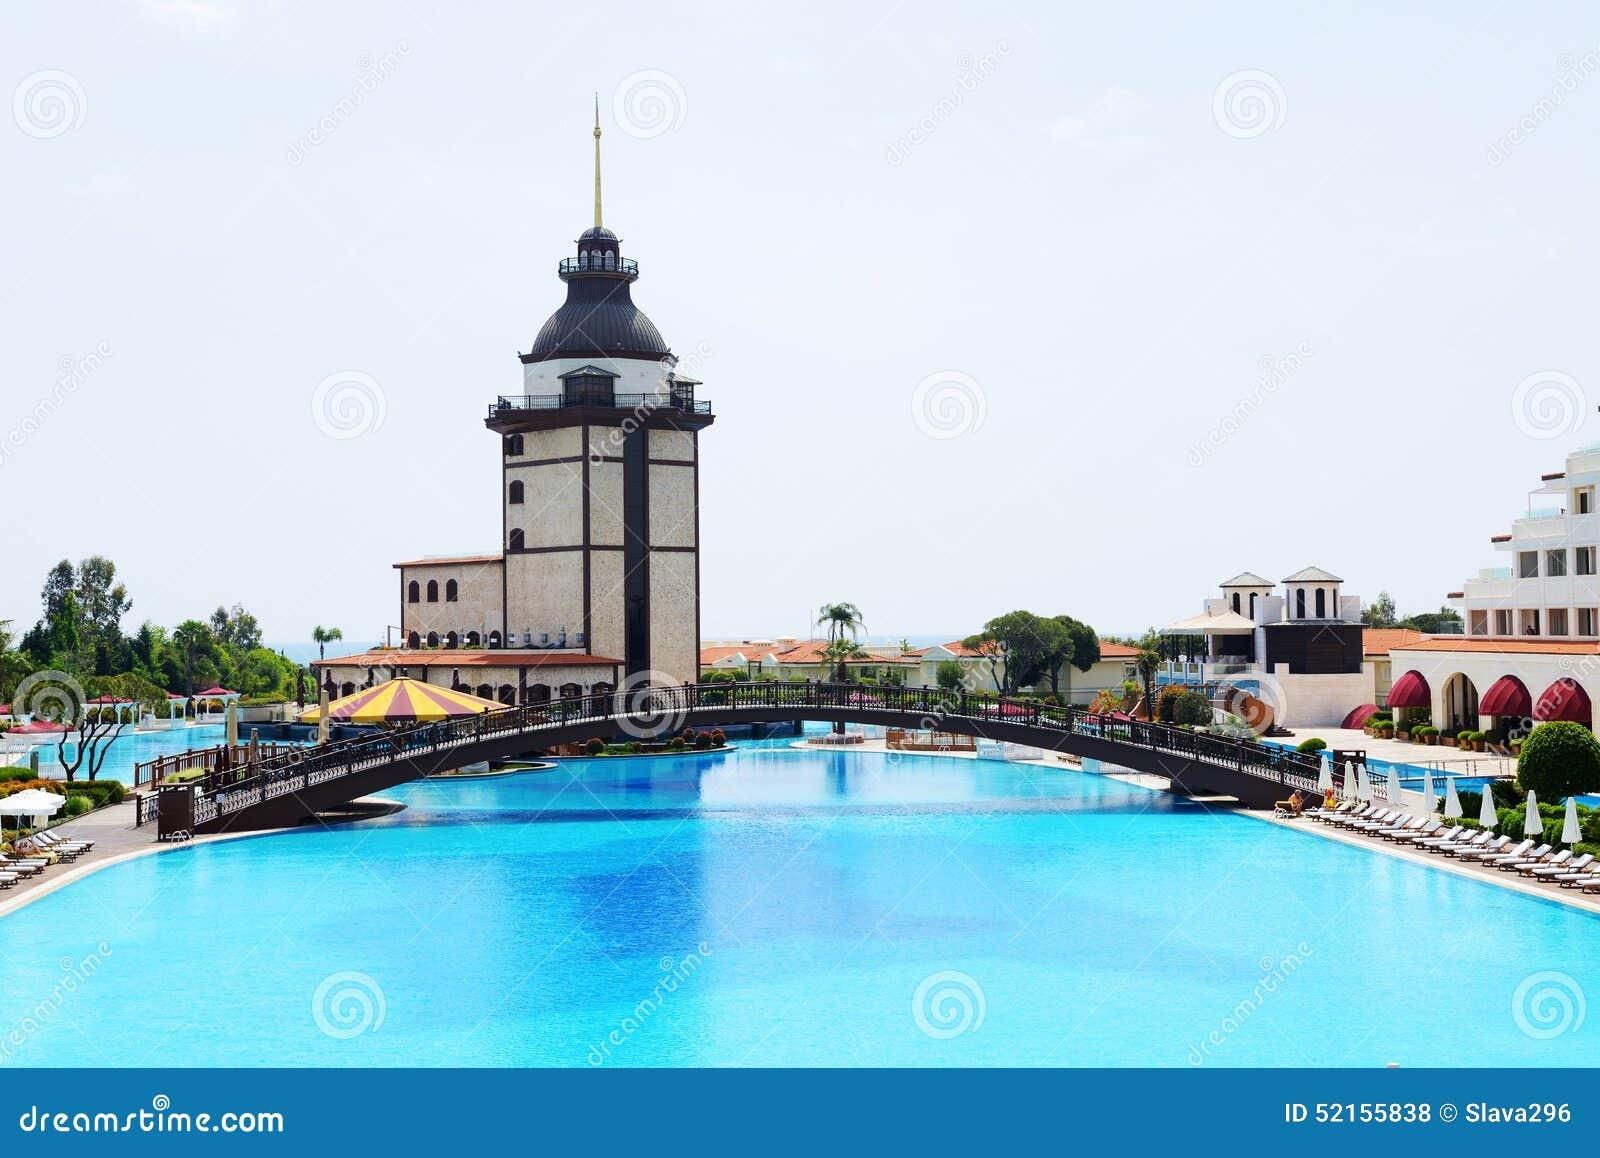 Modern Palace Hotel Turkey